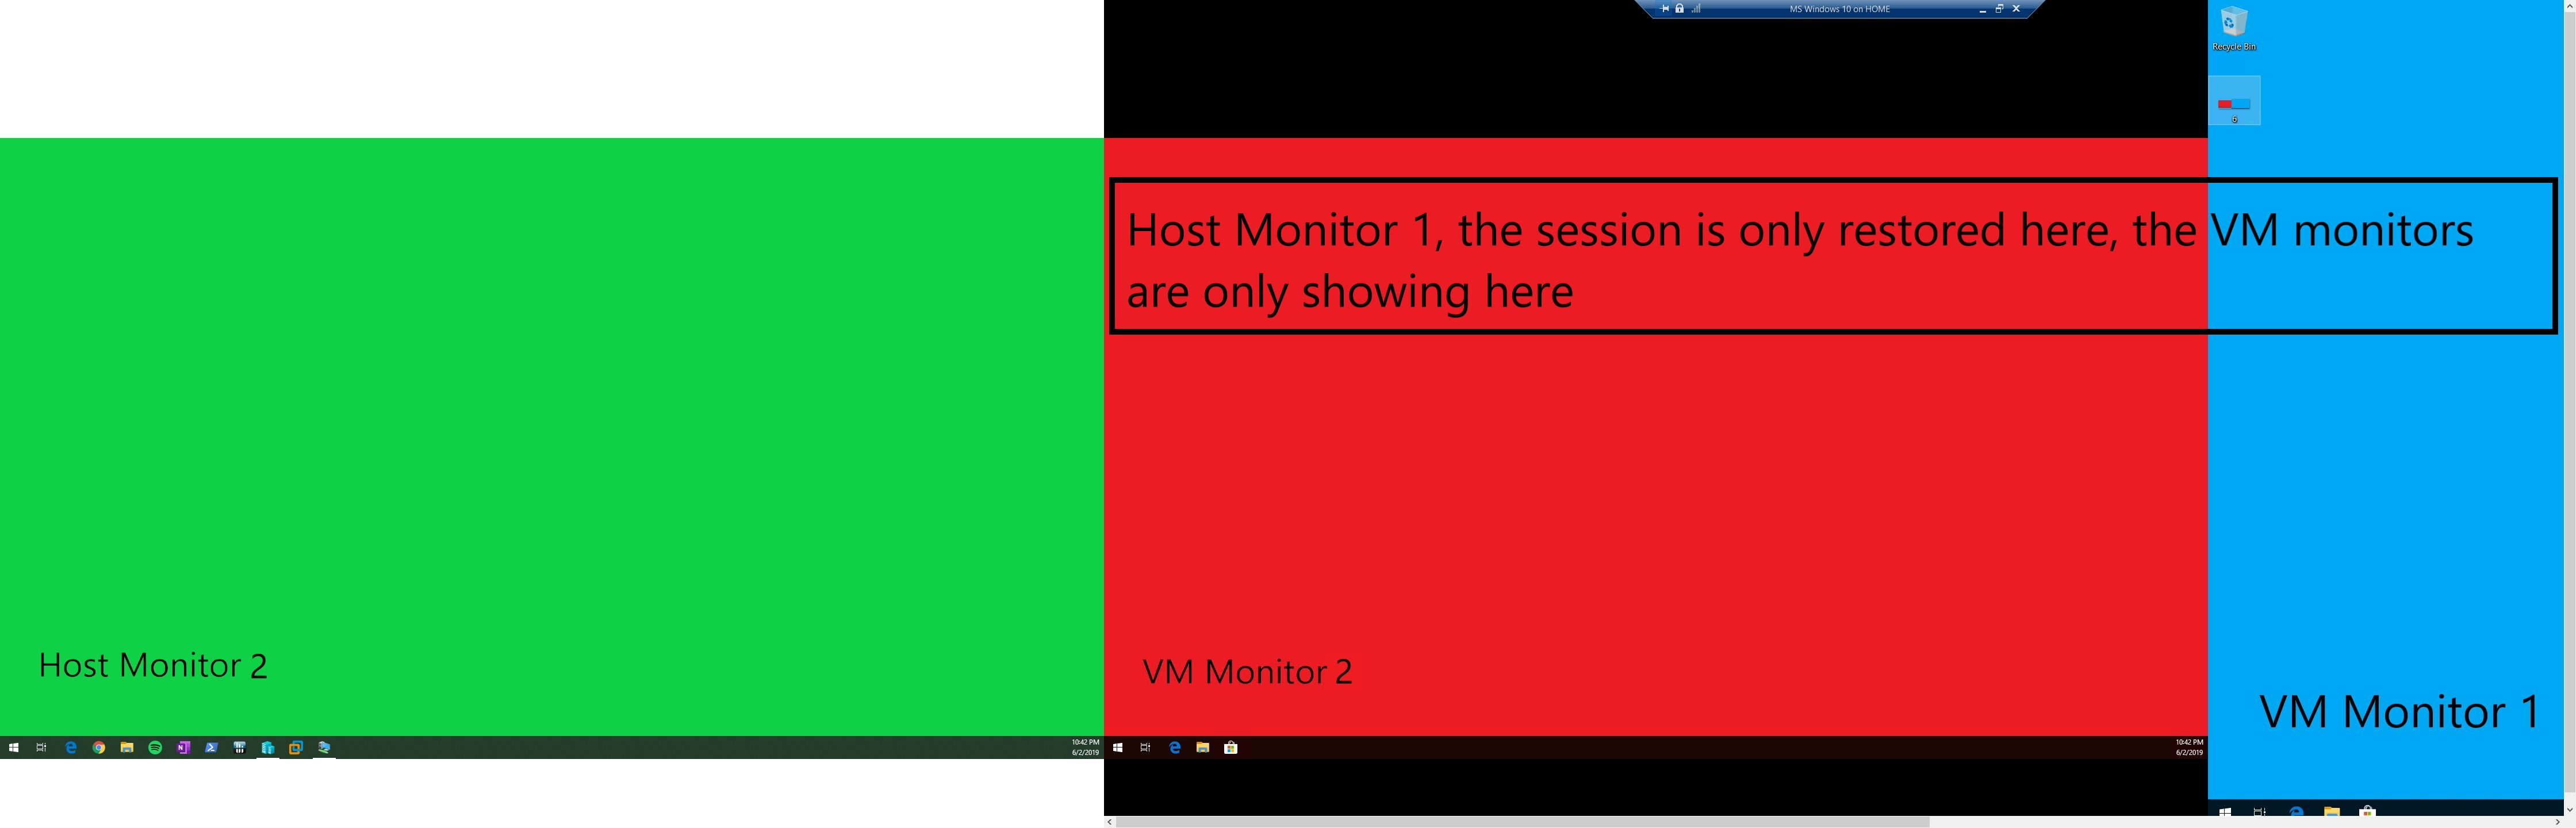 VM session restored.